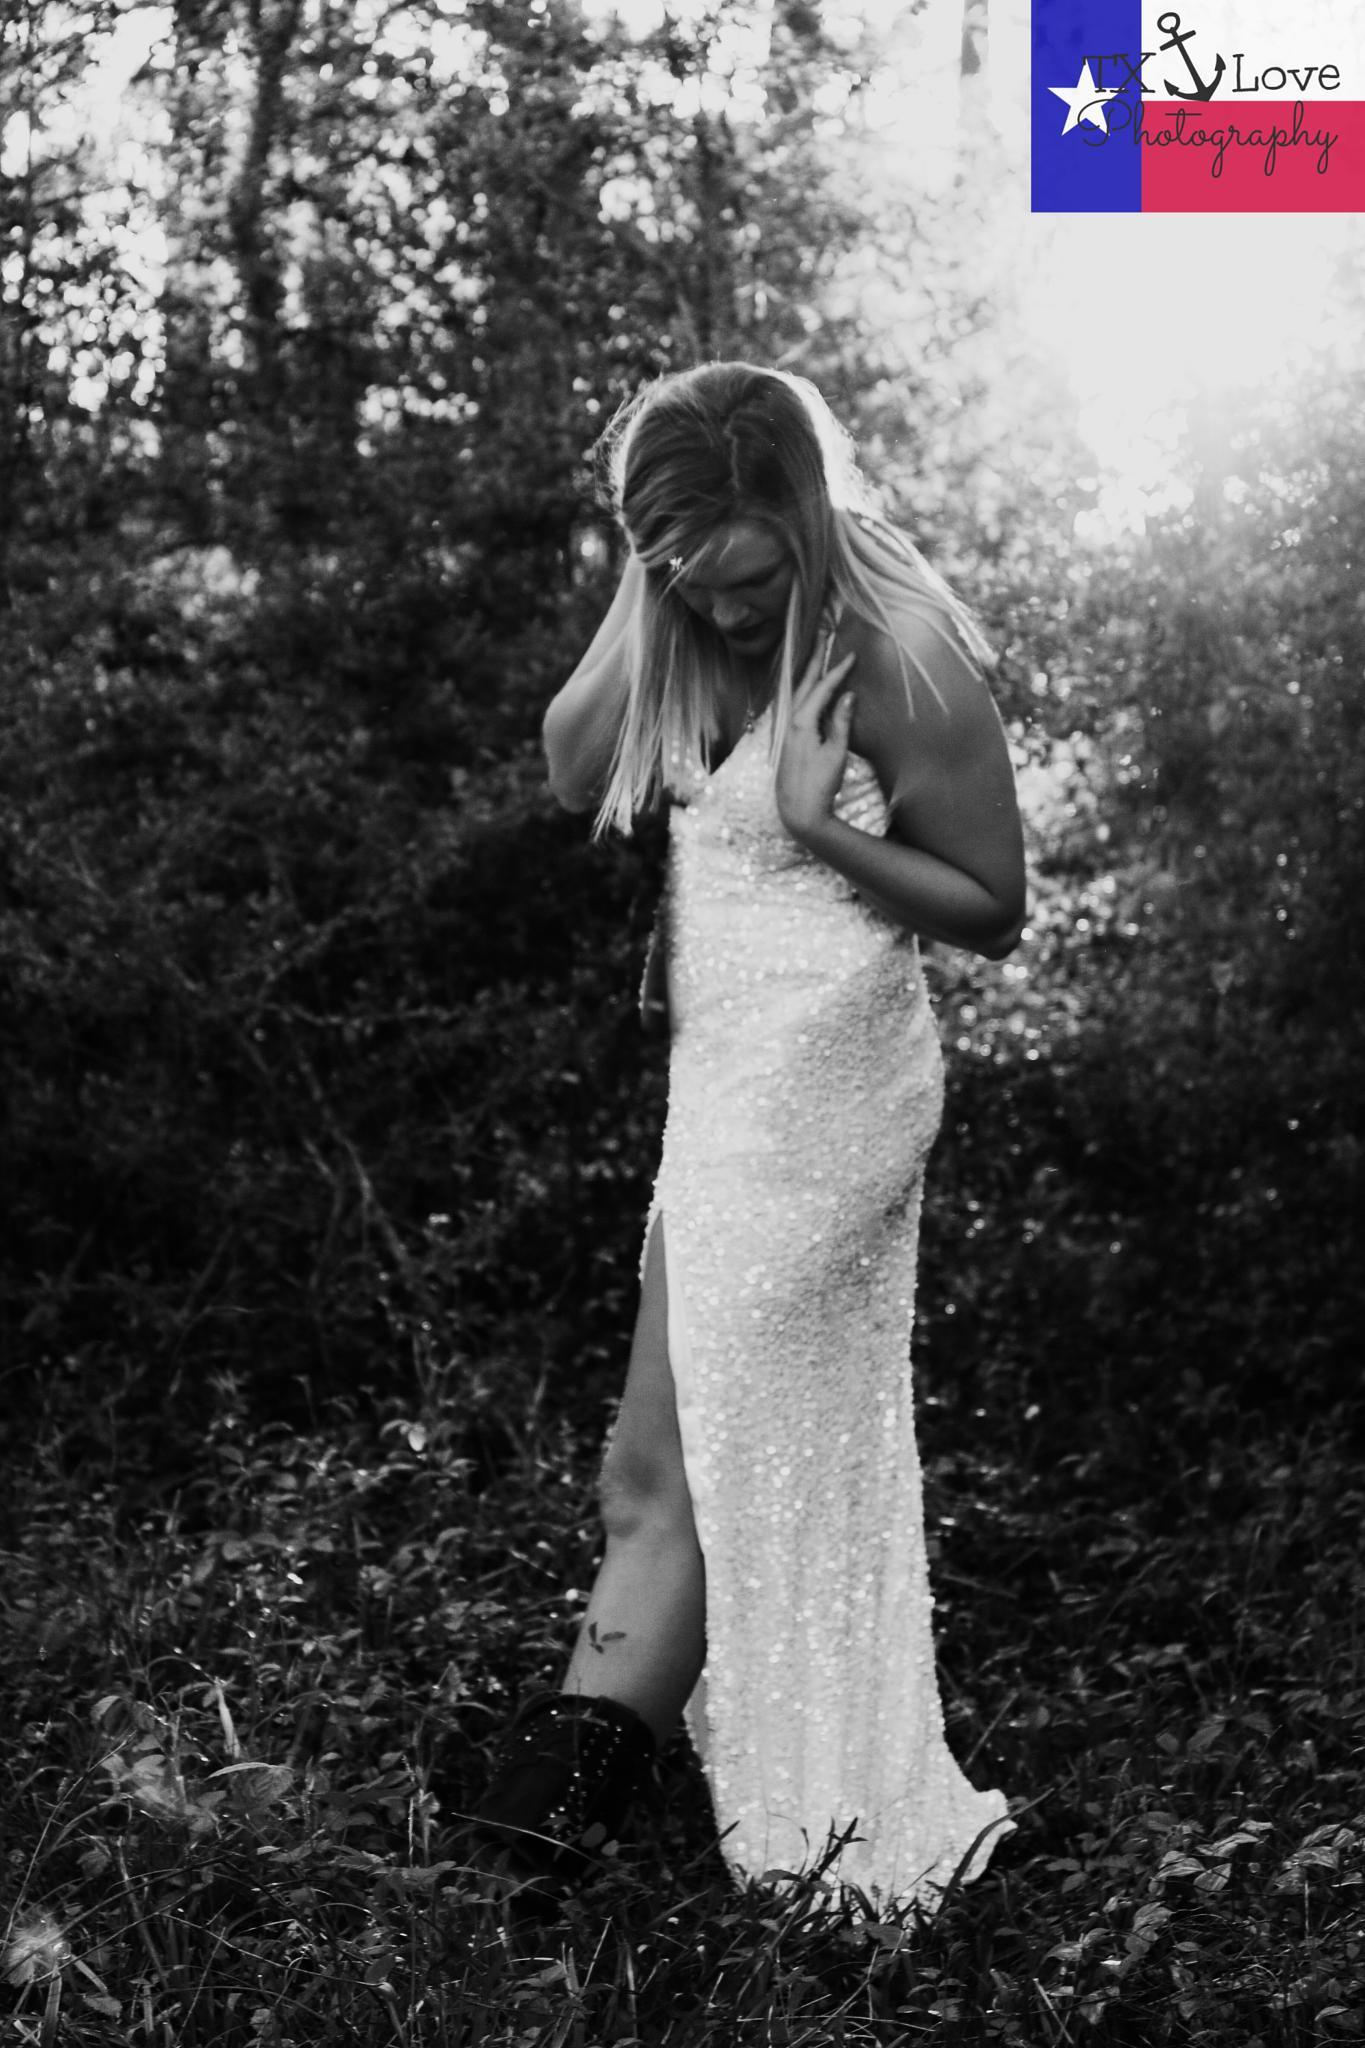 Part Mermaid by Kaitlyn Boryk